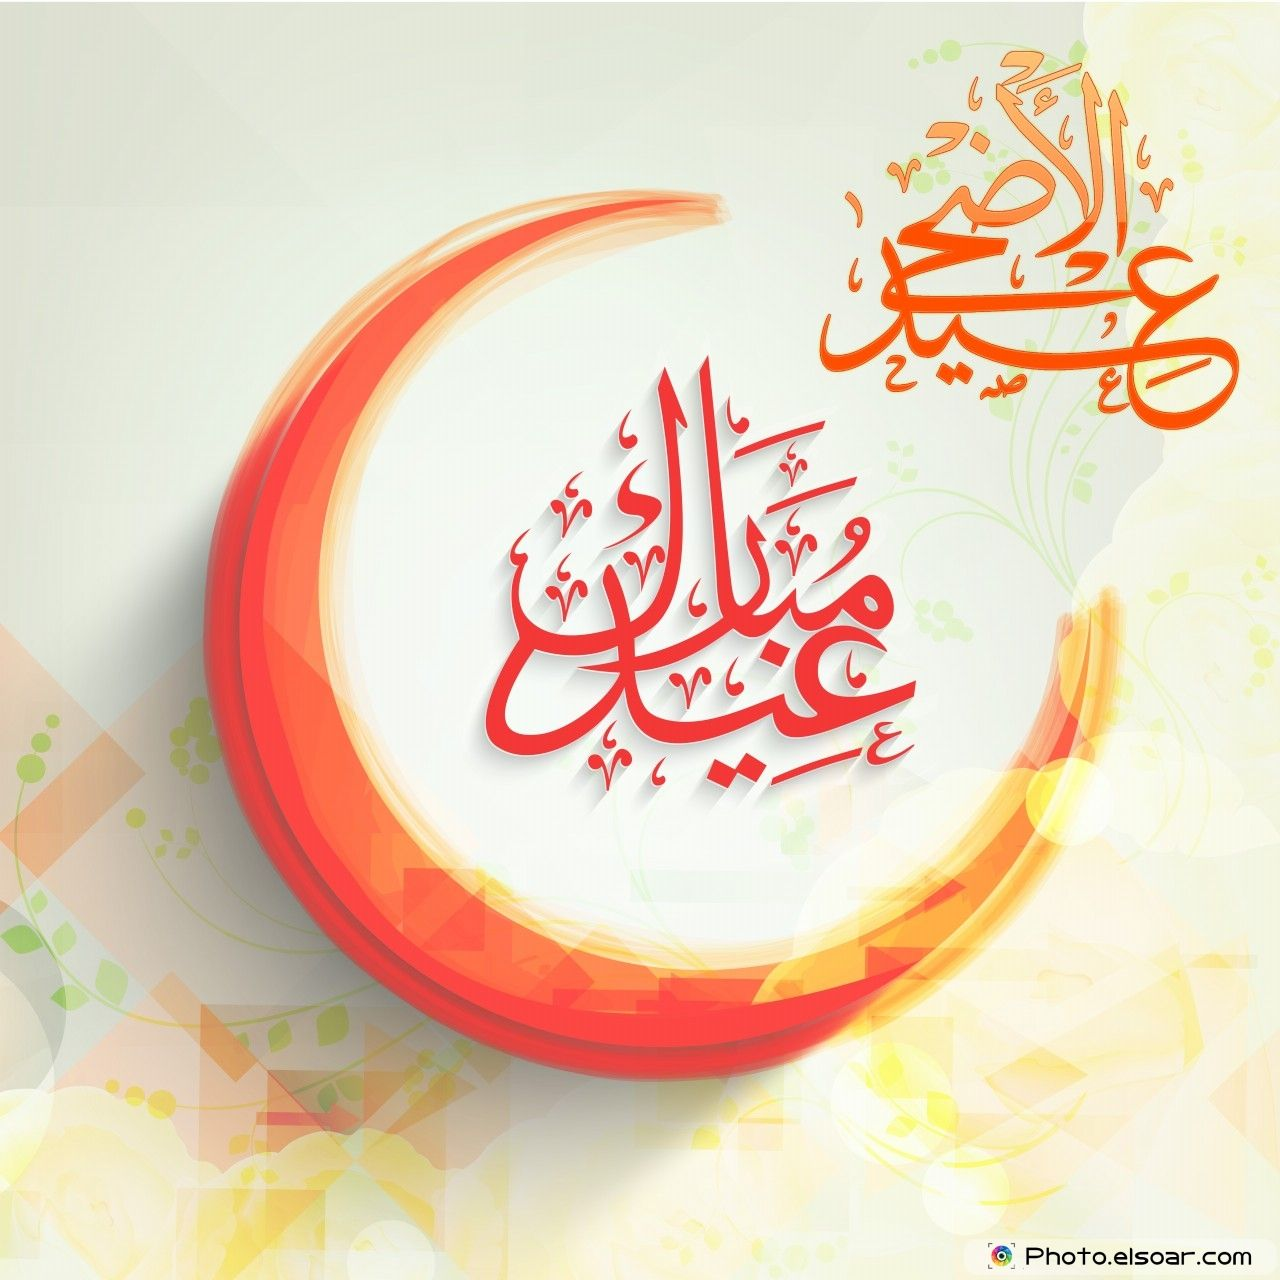 Eid mubarak eid al adha arabic islamic calligraphy happy eid eid mubarak eid al adha arabic islamic calligraphy m4hsunfo Images